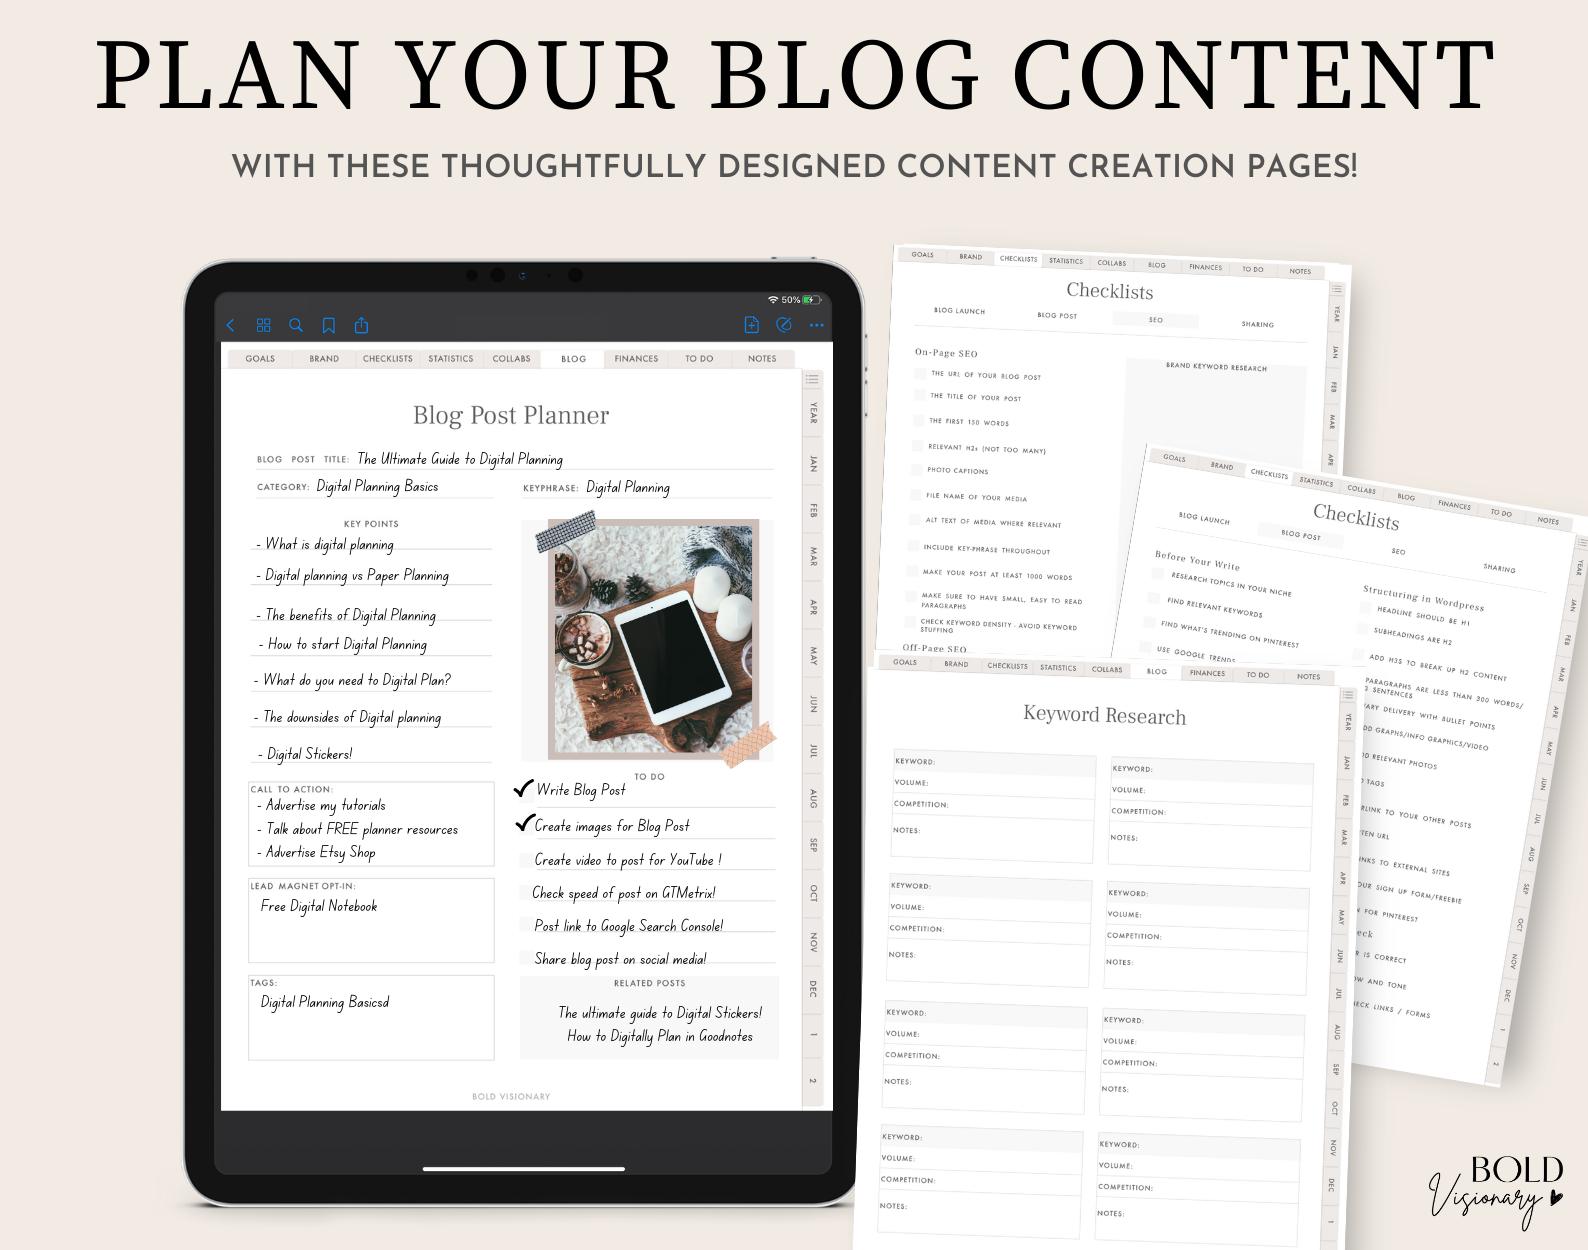 5Content-Bold-Visionary-Digital-Blog-Planner